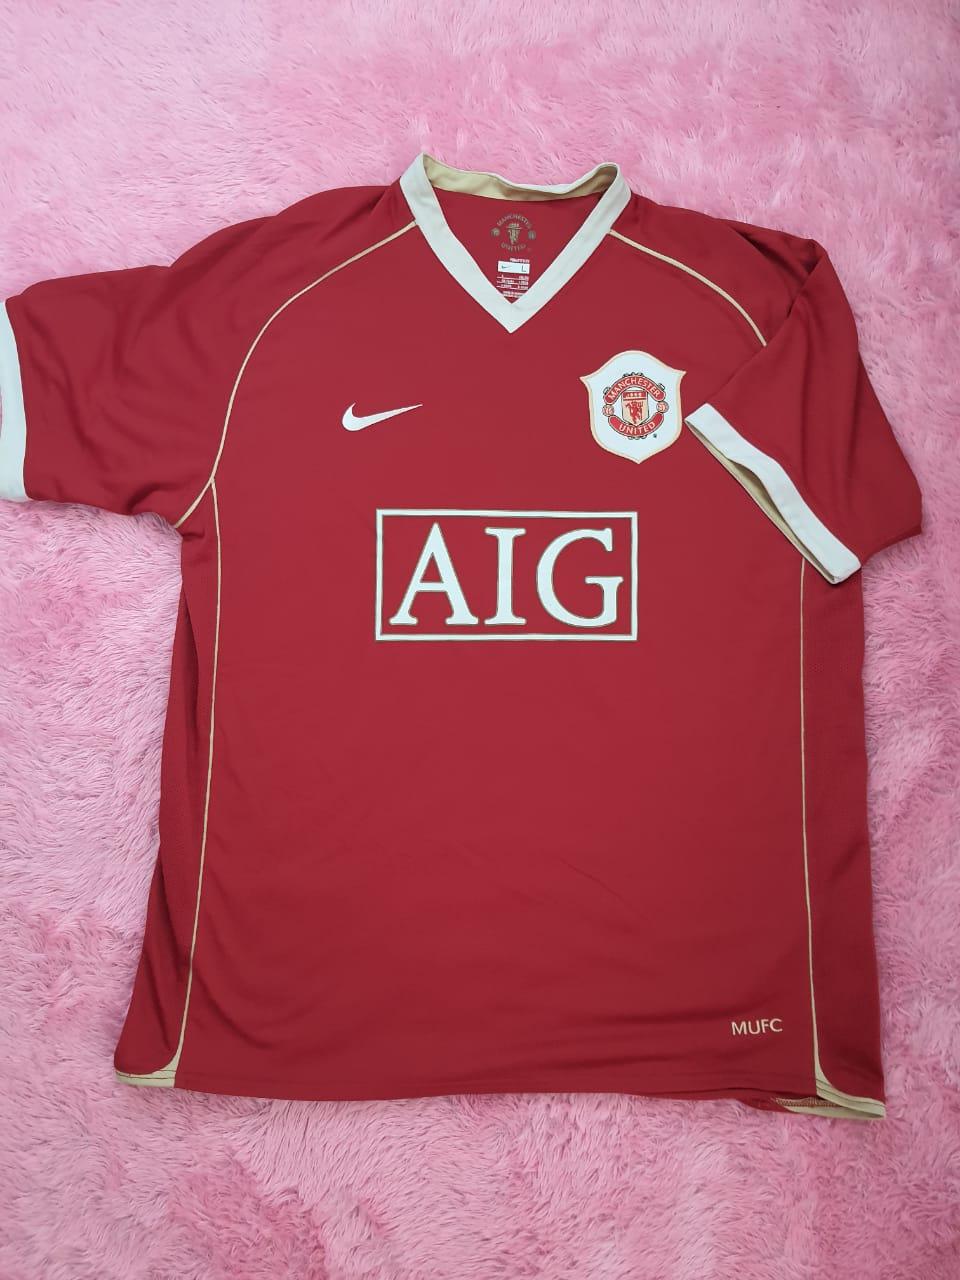 Jersey Nike Manchester United 2005-2006 Home (Original)